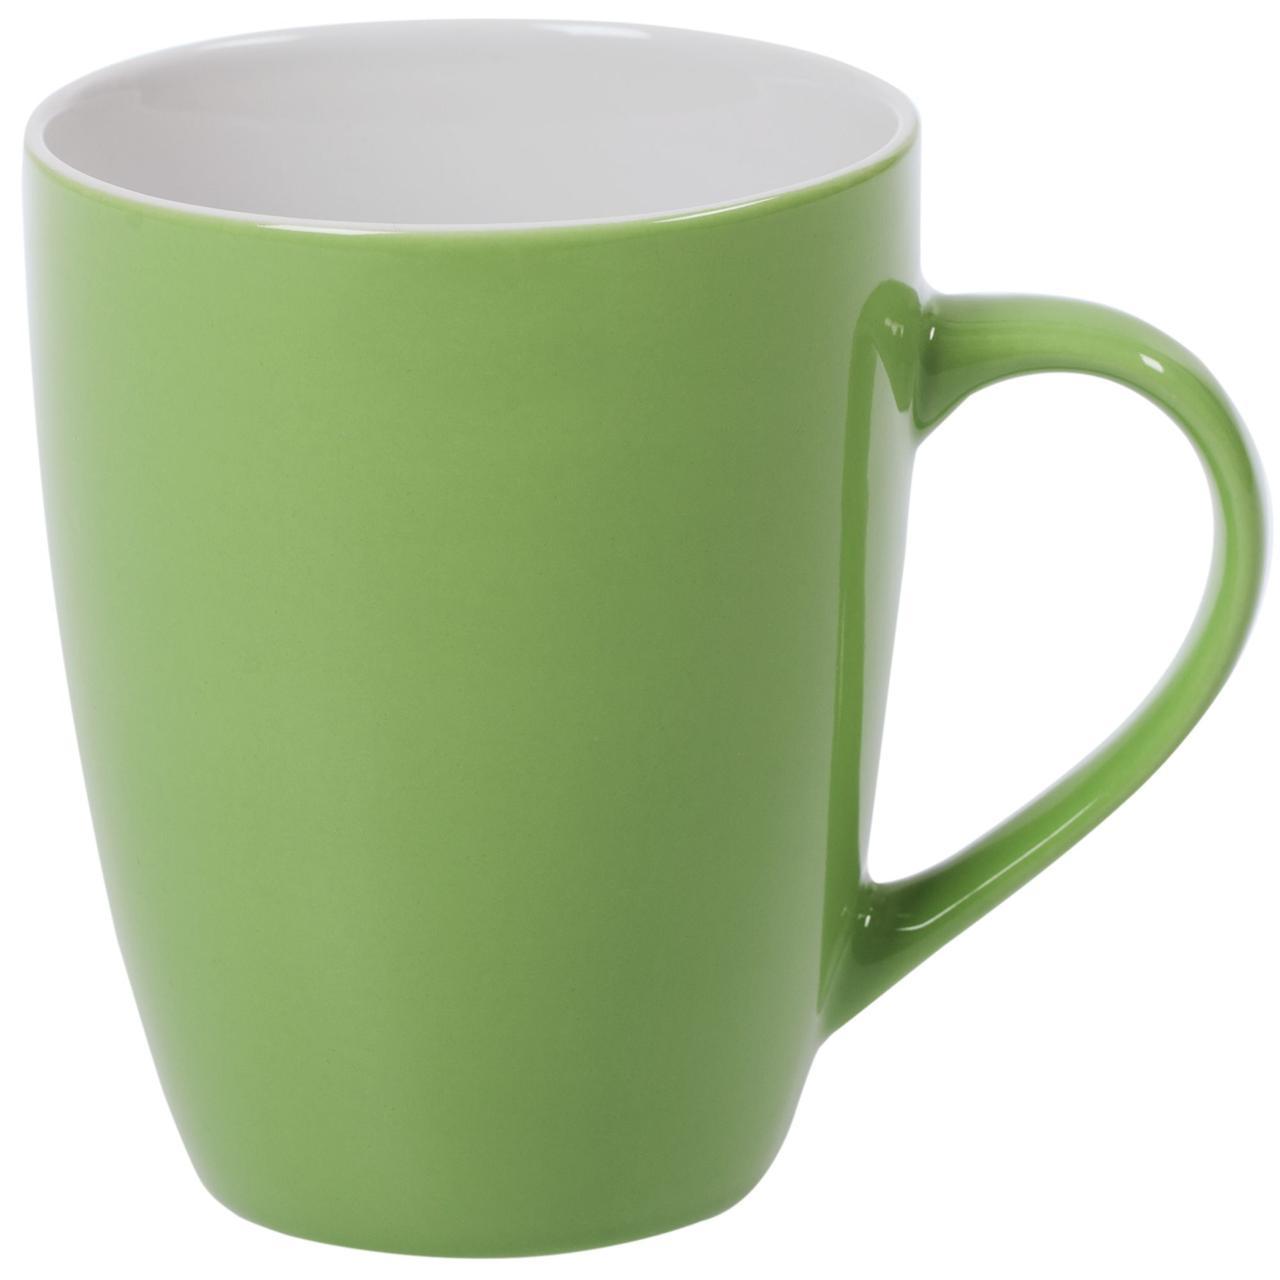 Кружка Good Morning, зеленое яблоко (артикул 6478.94)